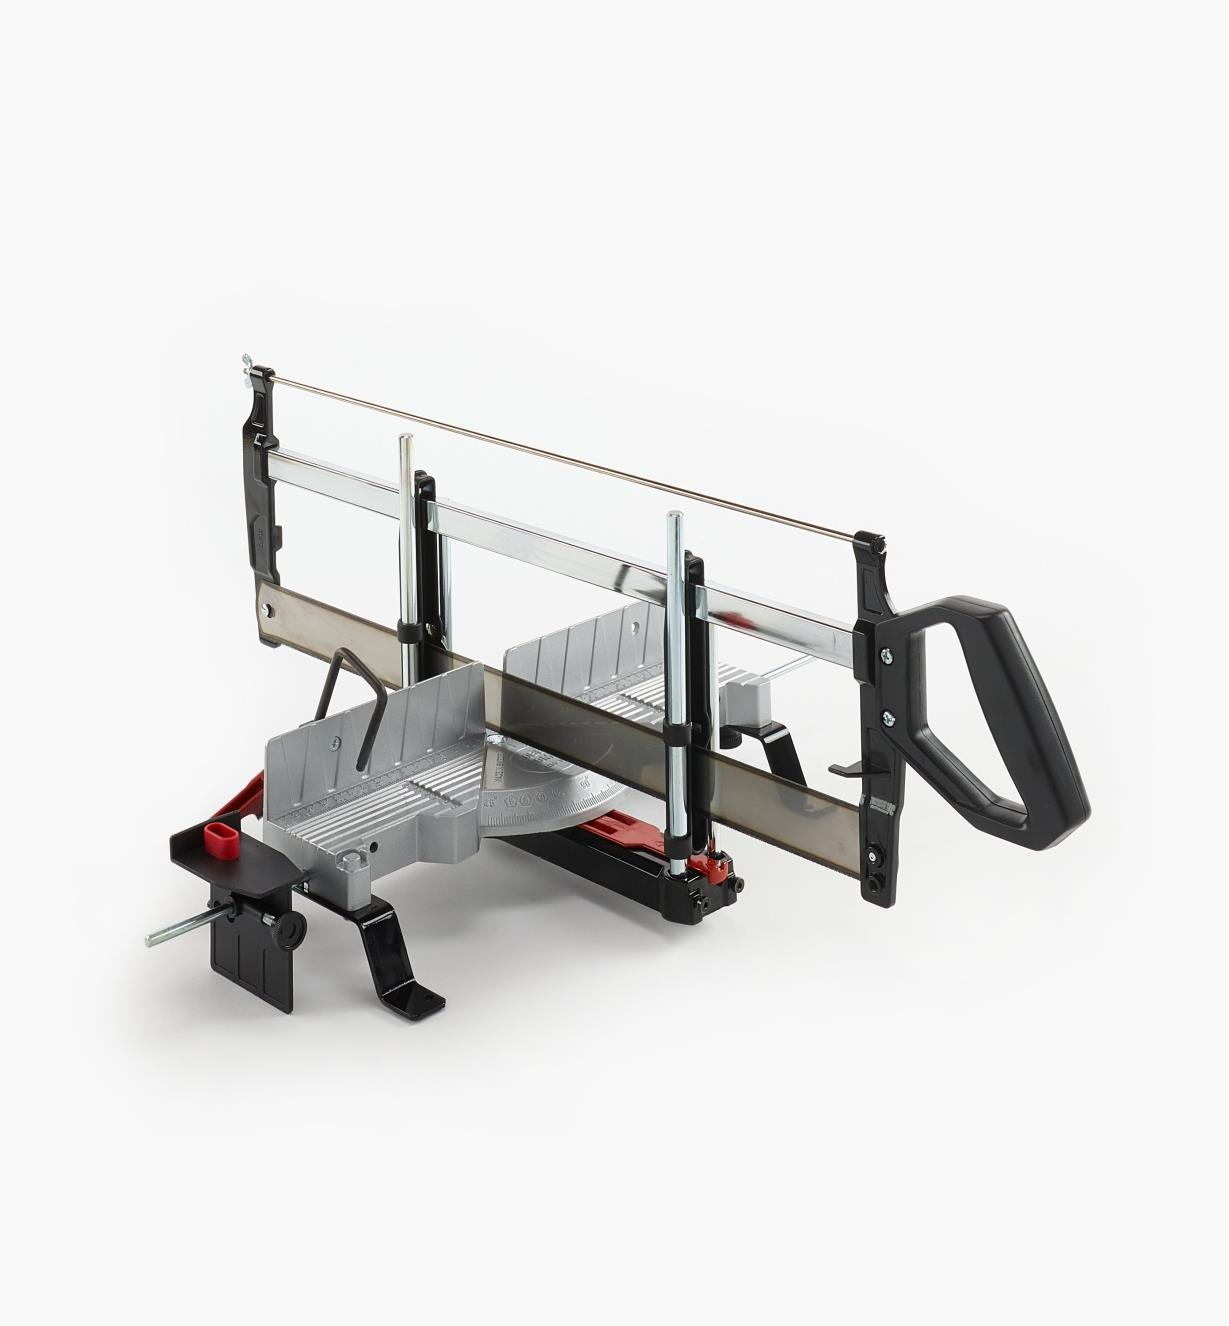 01H0701 - Standard Miter Box